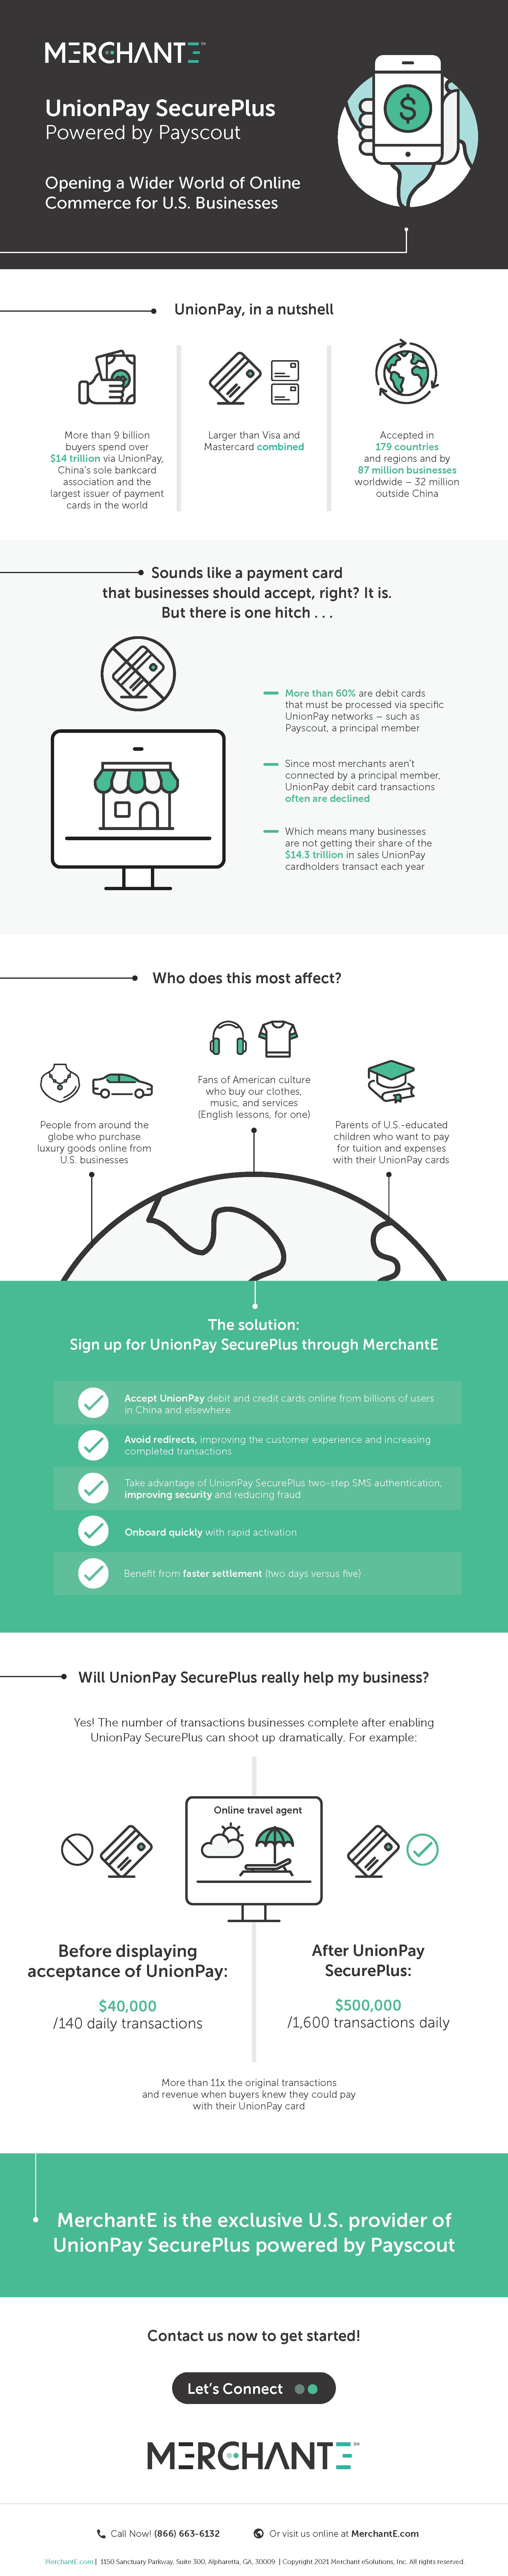 ME - Infographic - UnionPay SecurePlus